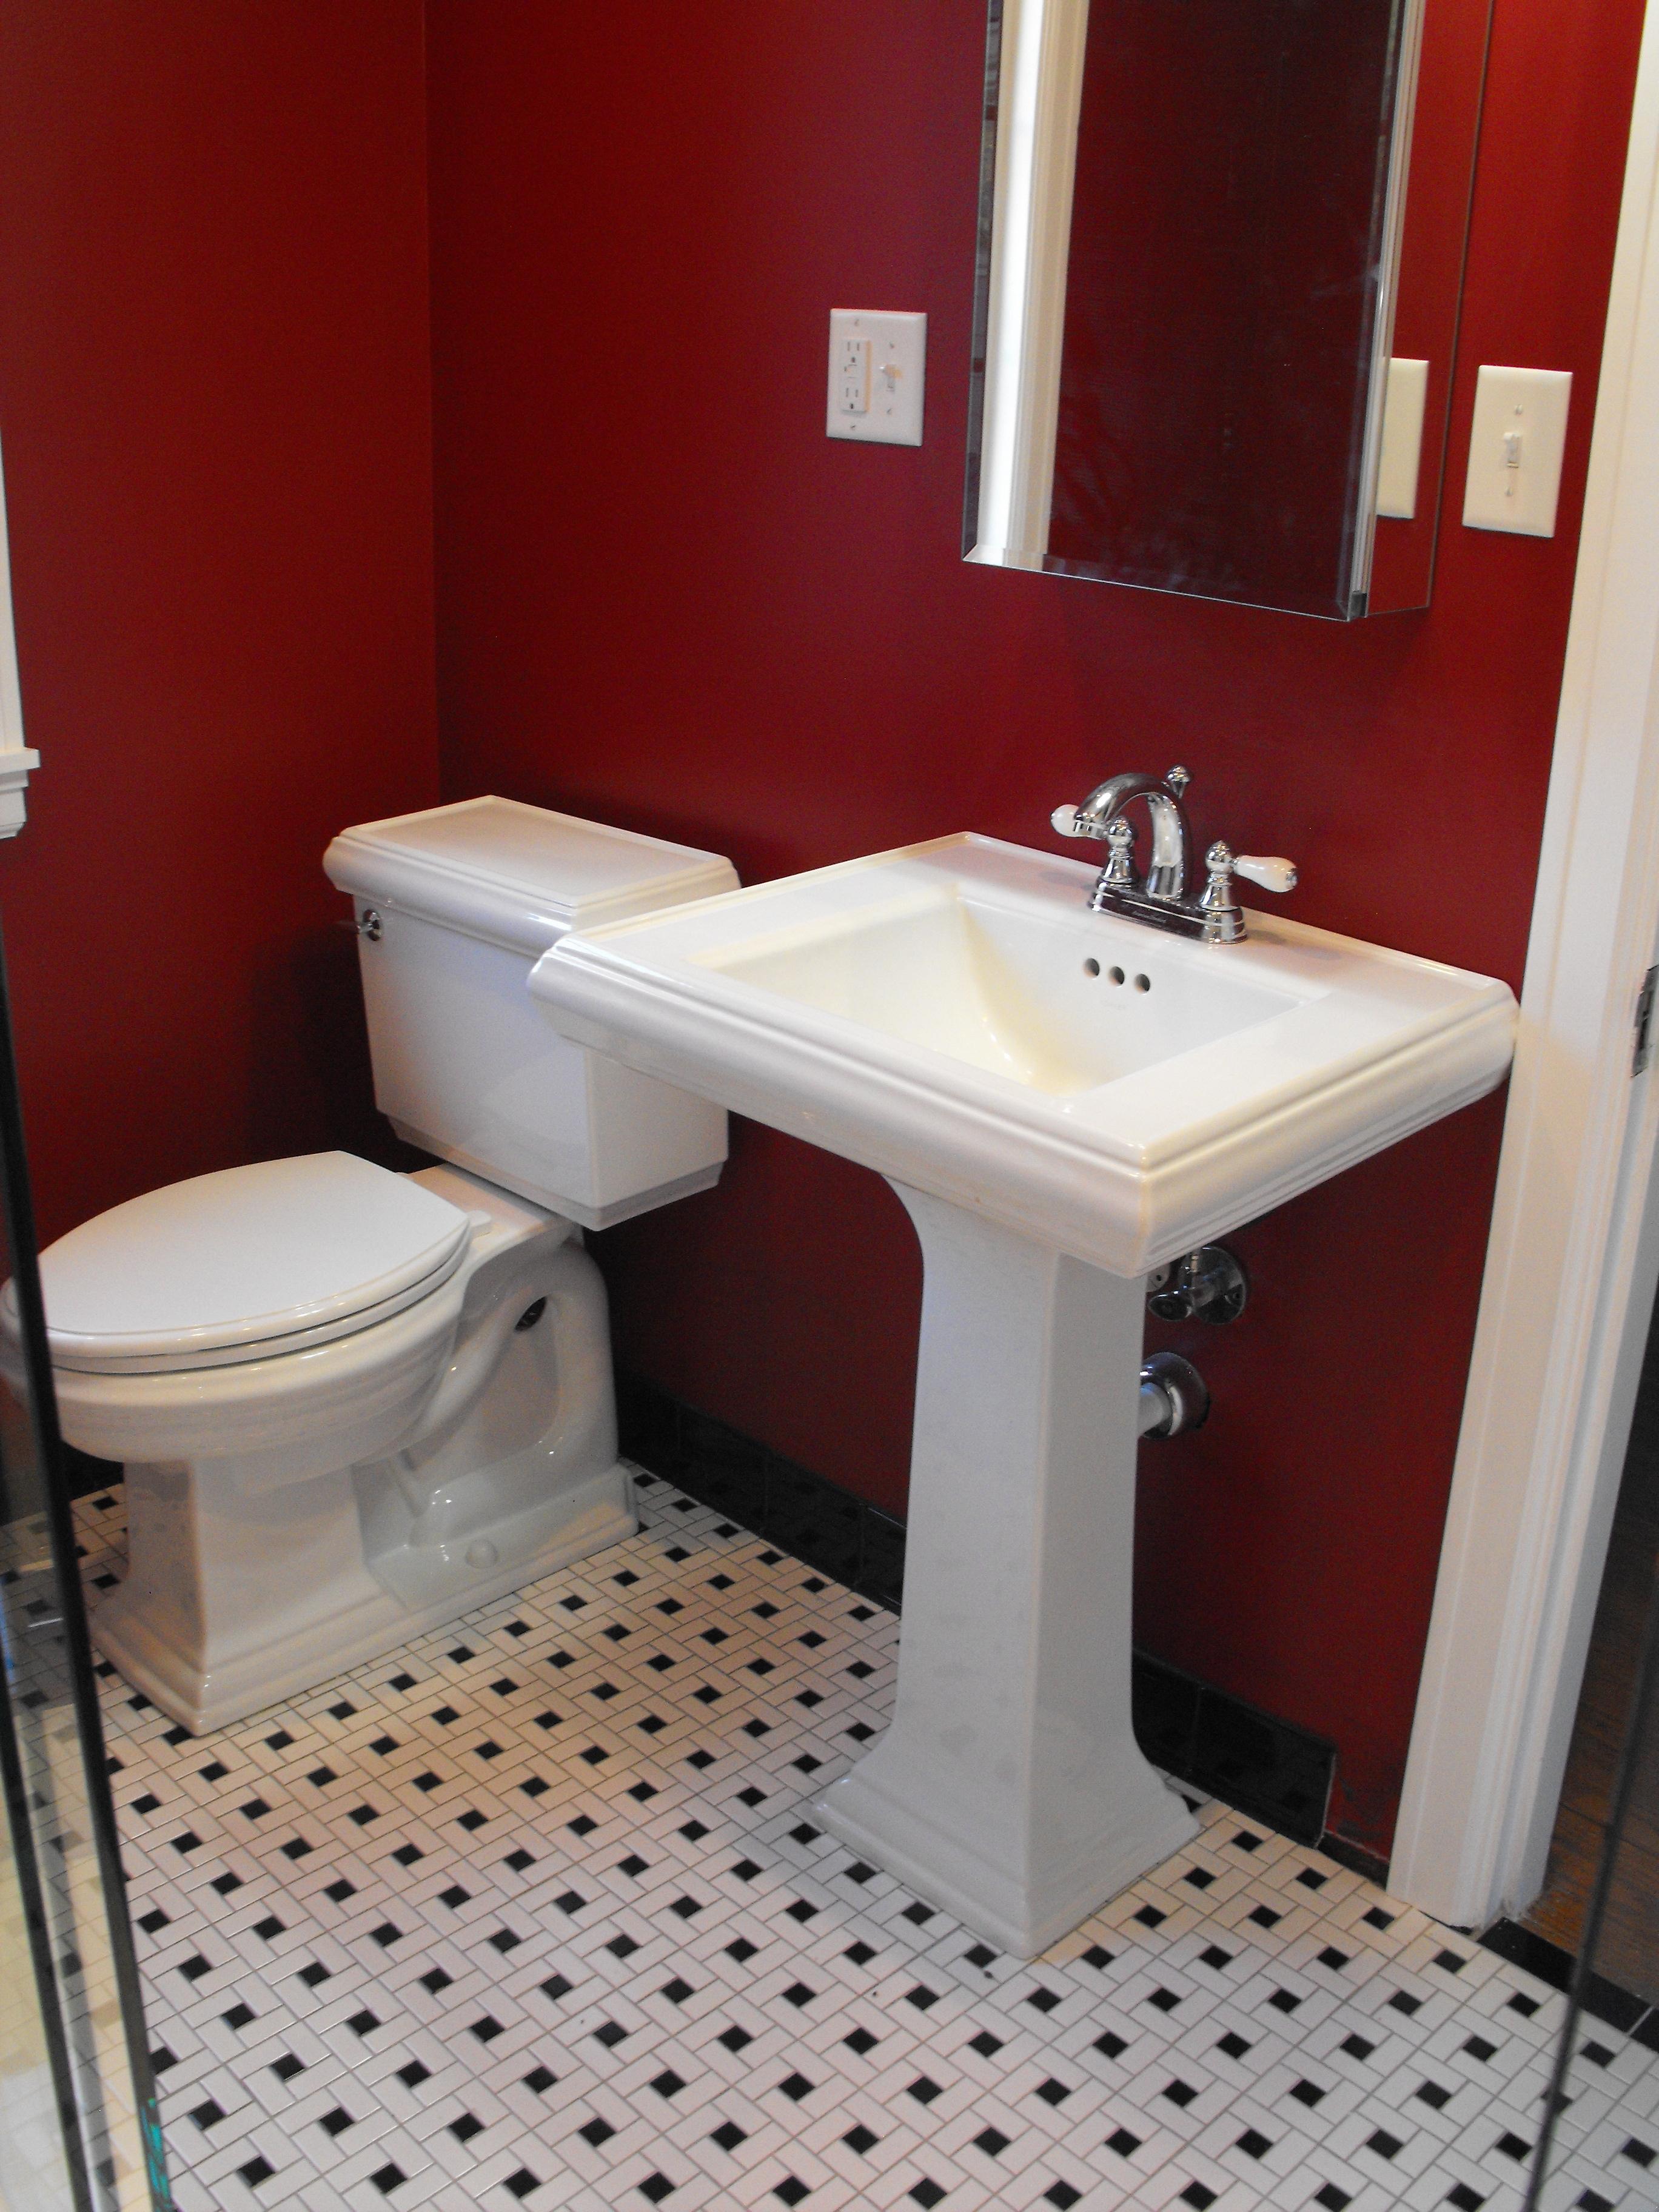 Bathroom Fixtures Knoxville Tn bathroom plumbing fixtures knoxville tn - bathroom design